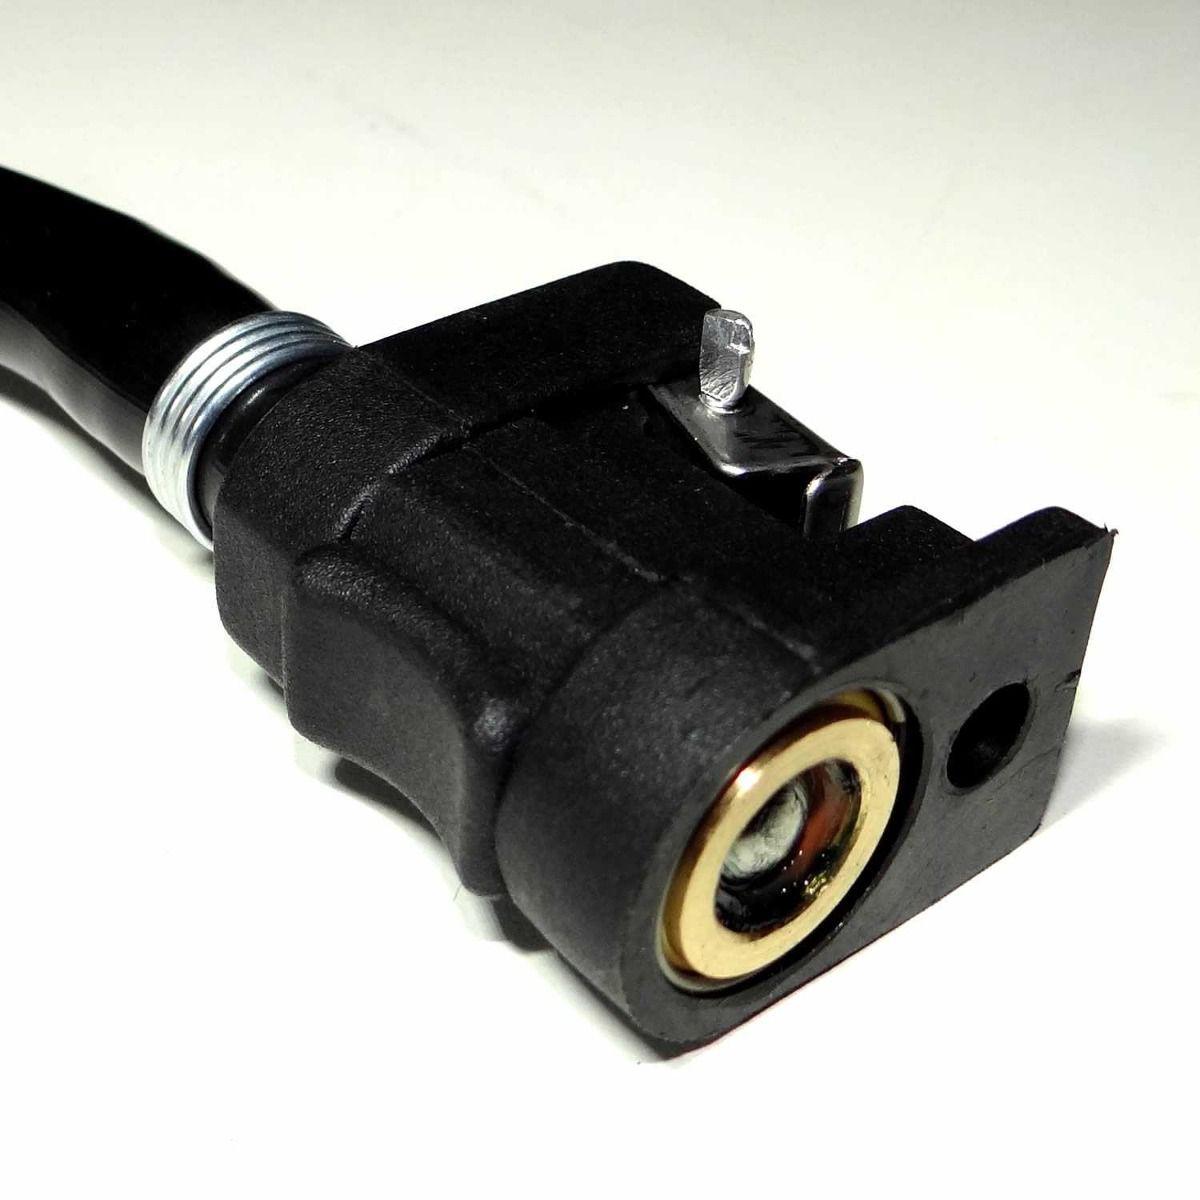 Conector De Combustivel Motor Popa Yamaha - Femea